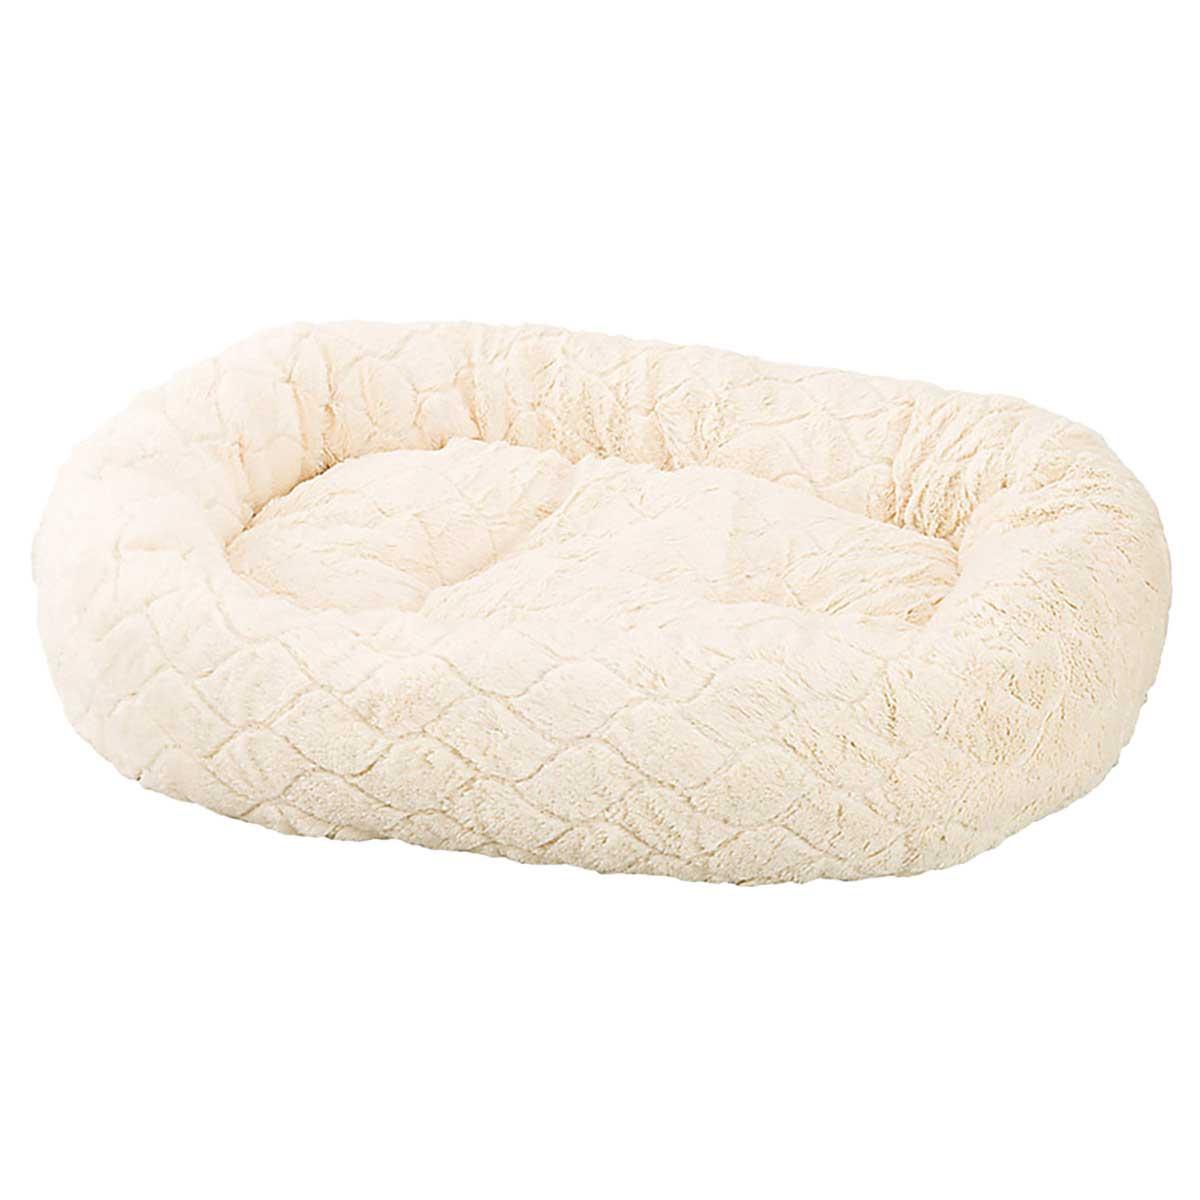 Diamond Cut Design 27 inch Cream Sleep Zone Lounger Oval Cuddler Bed for Pets